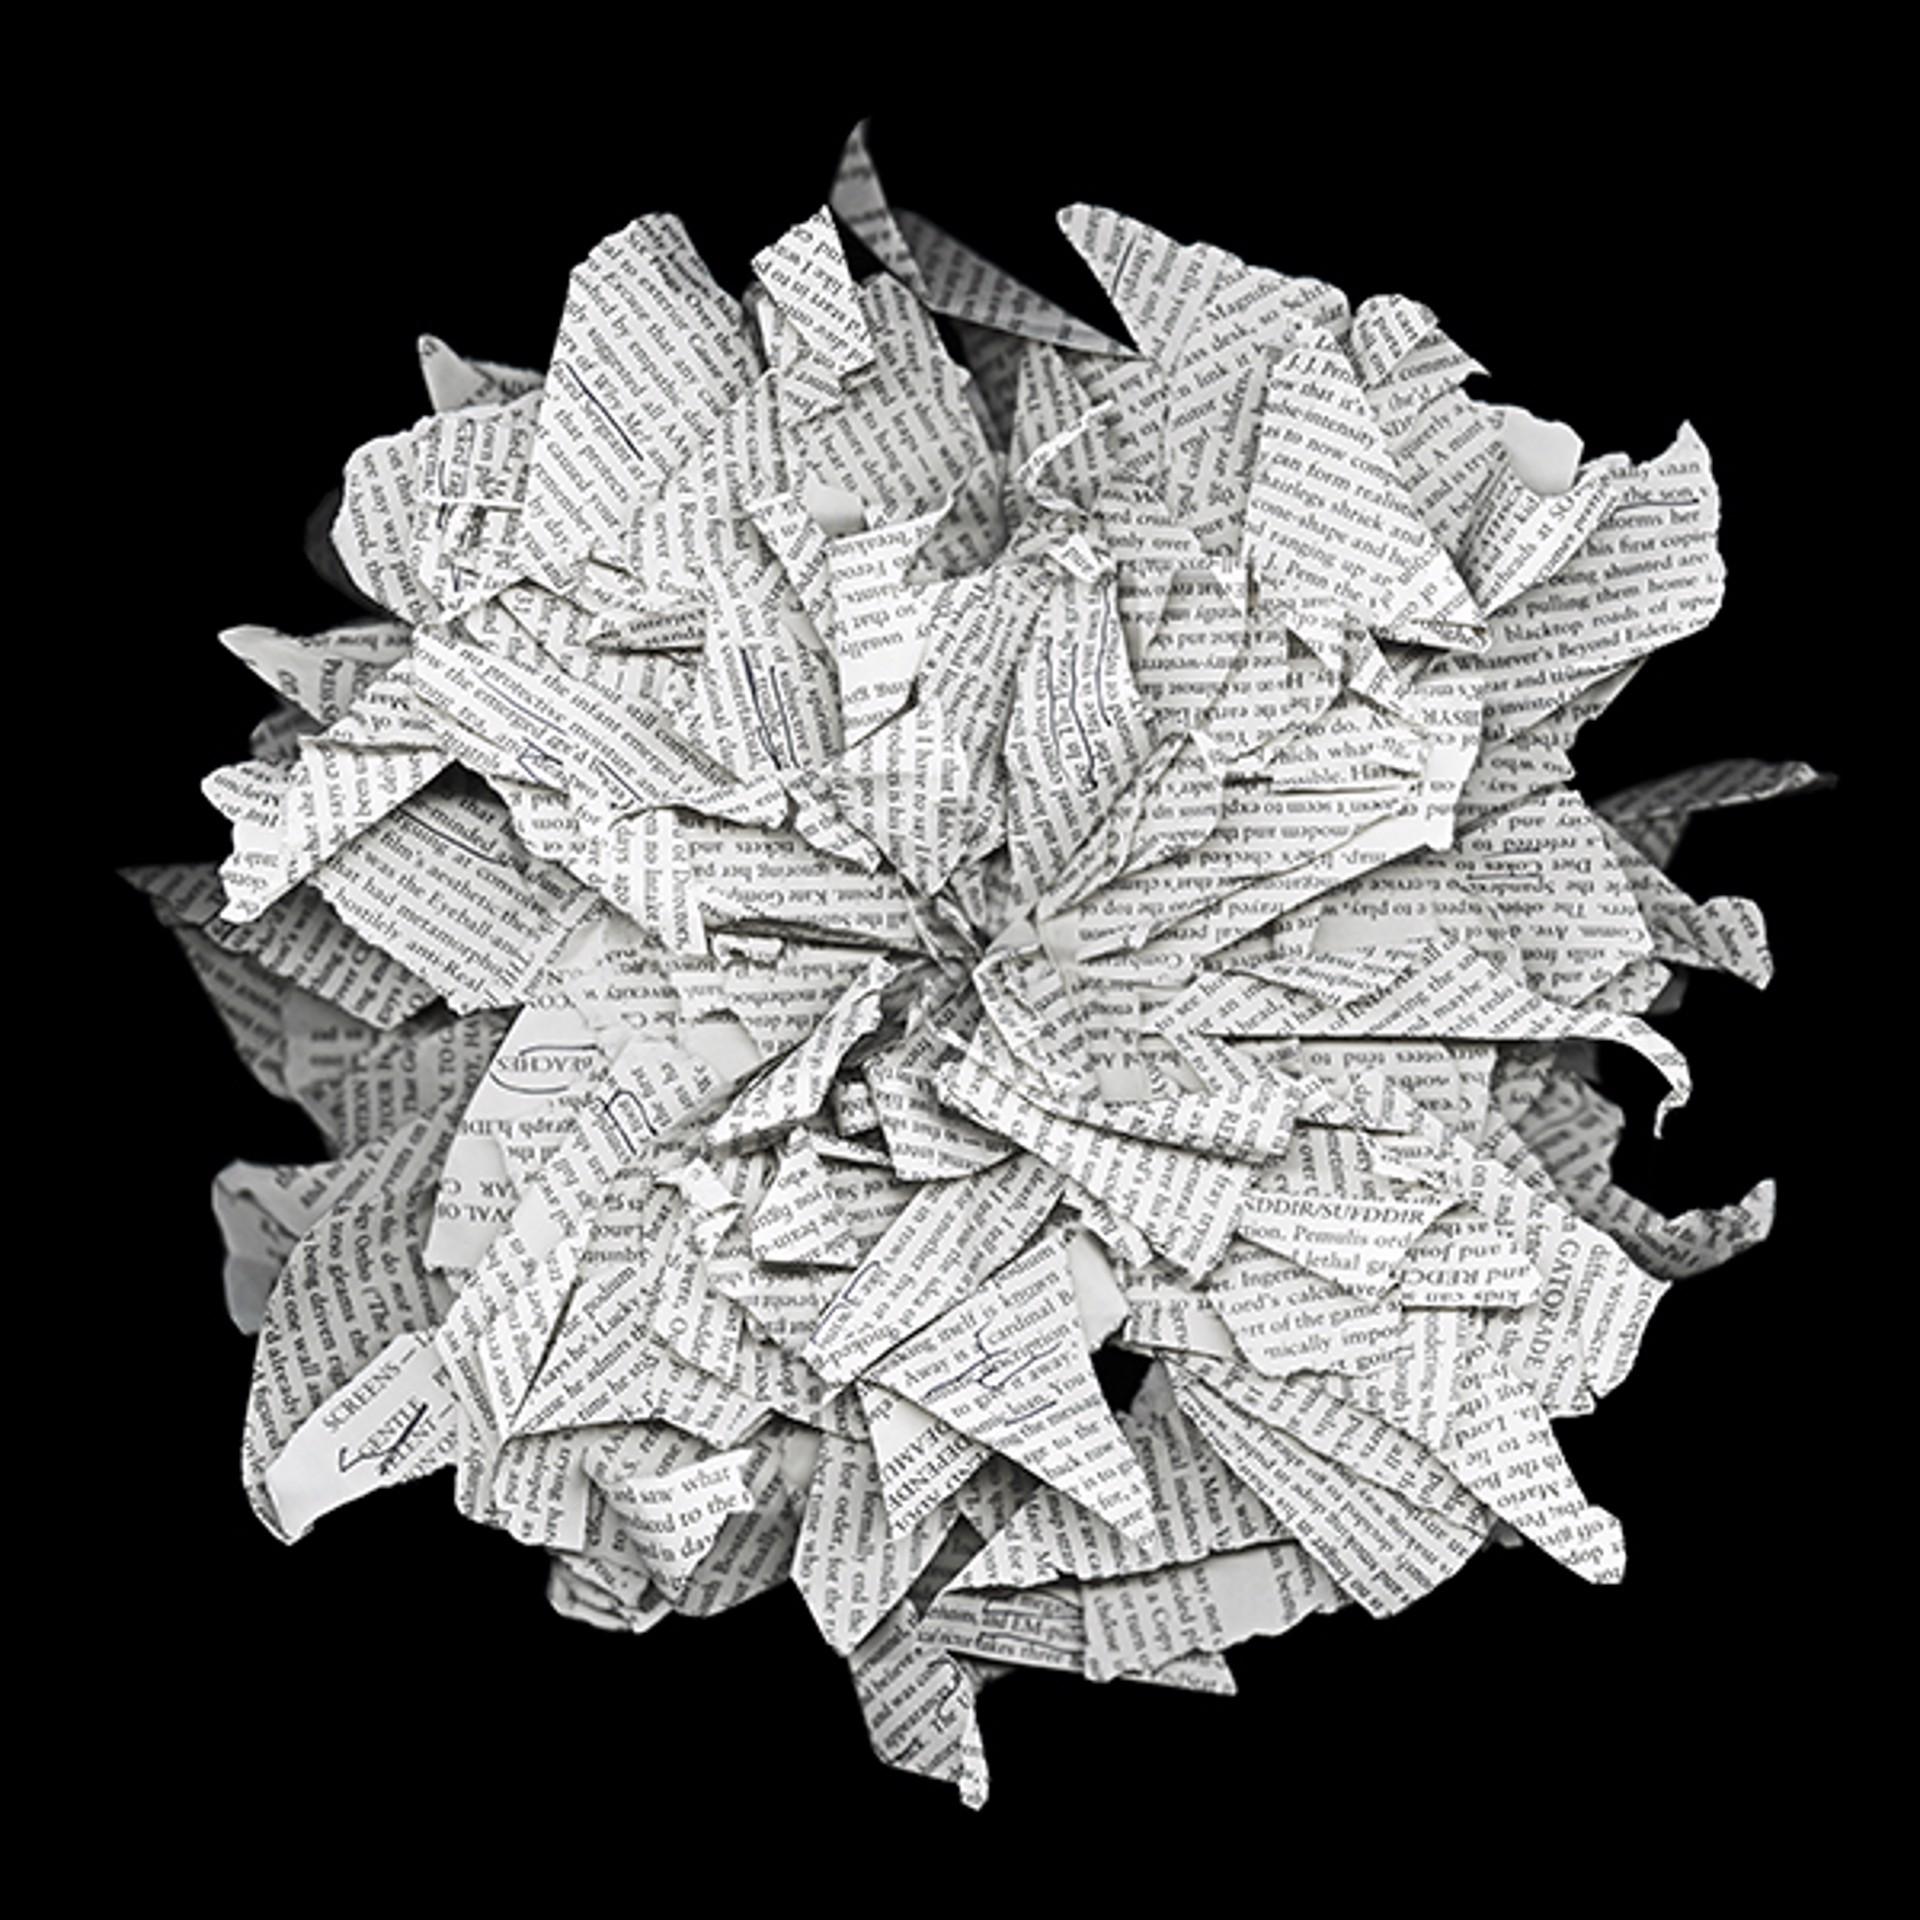 Freeform Origami by Cara Barer